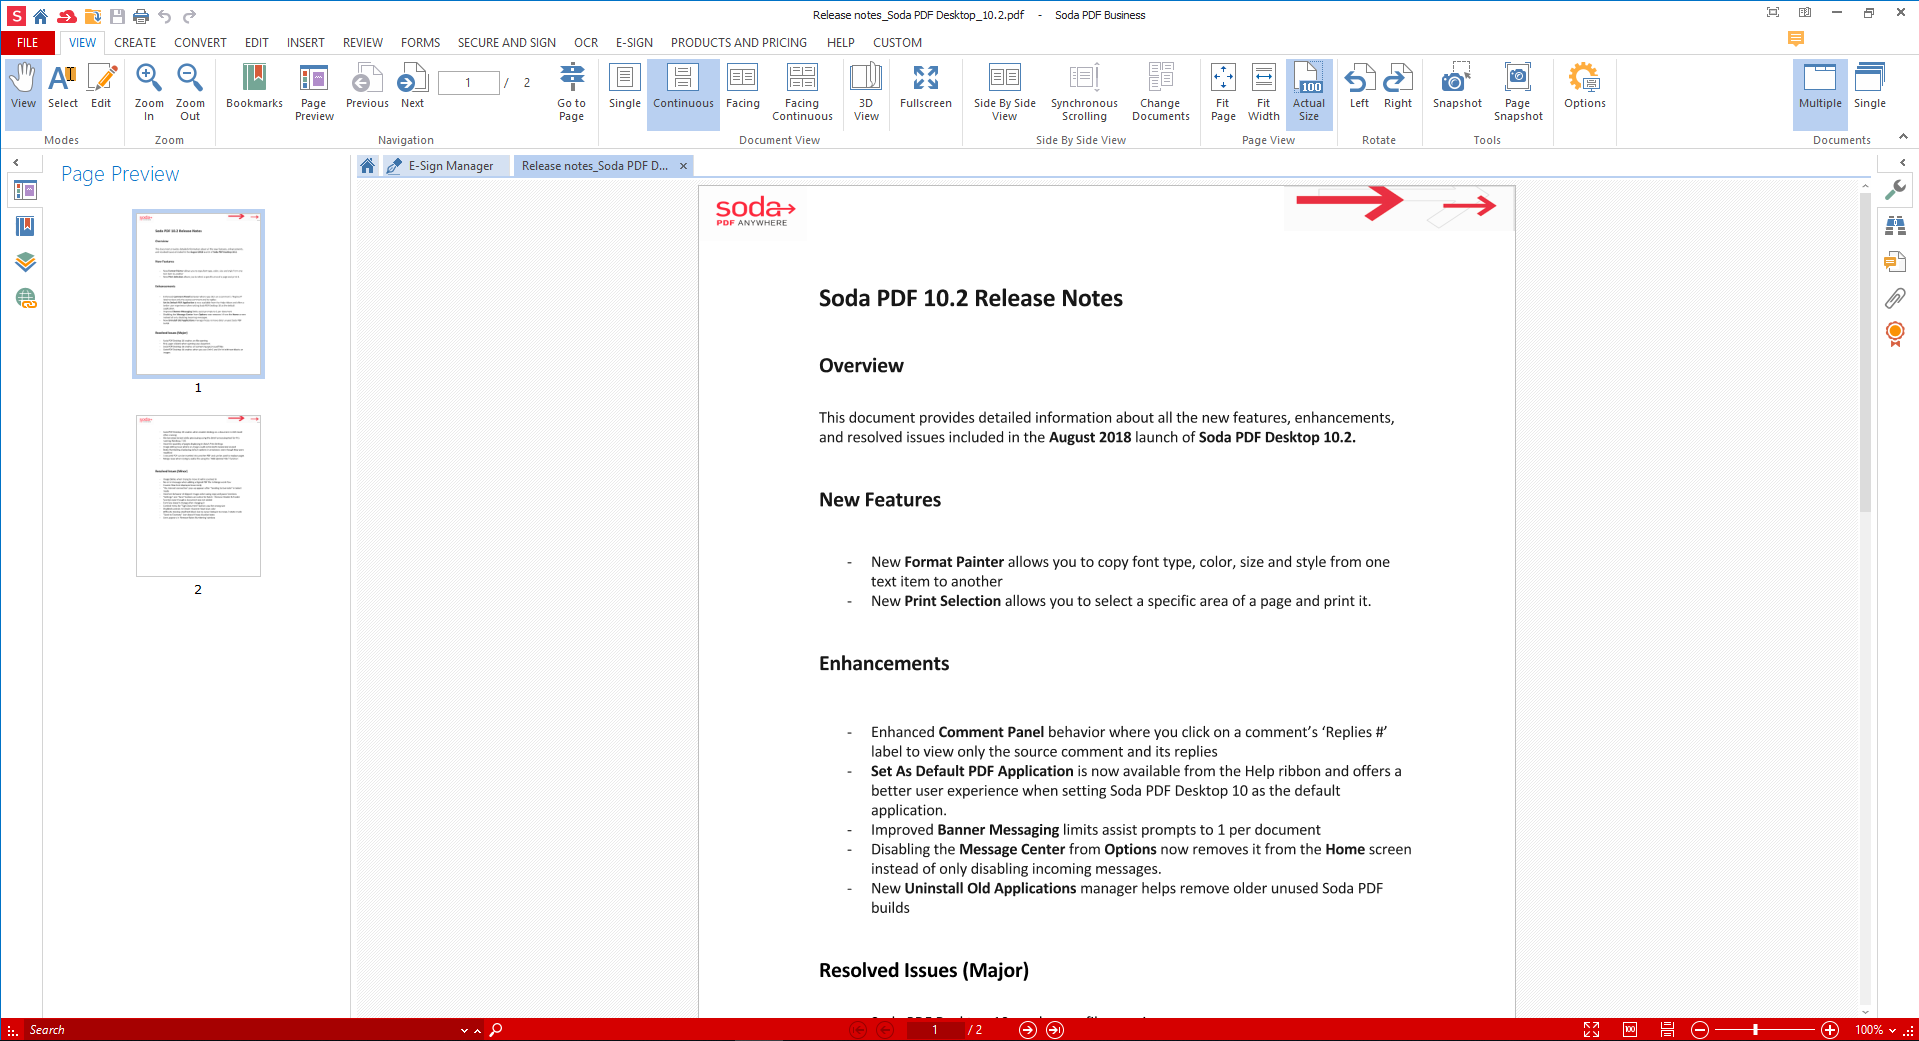 Soda PDF 10.2 Release Notes